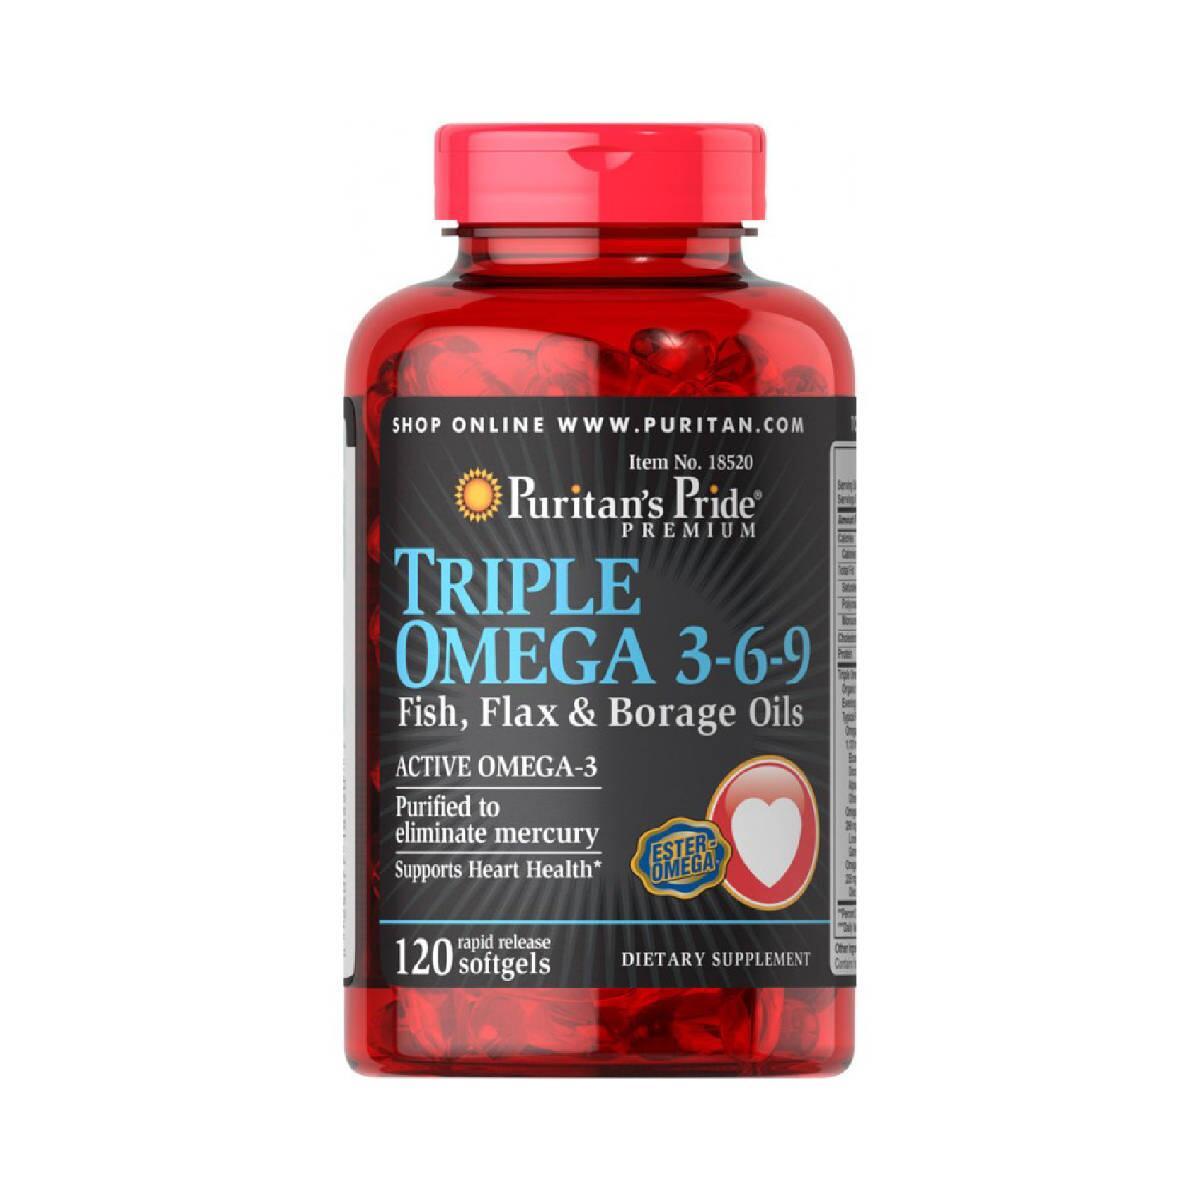 Puritan's Pride Triple Omega 3 6 9 Fish, Flax & Borage Oils 120 Viên - hỗ trợ tim mạch